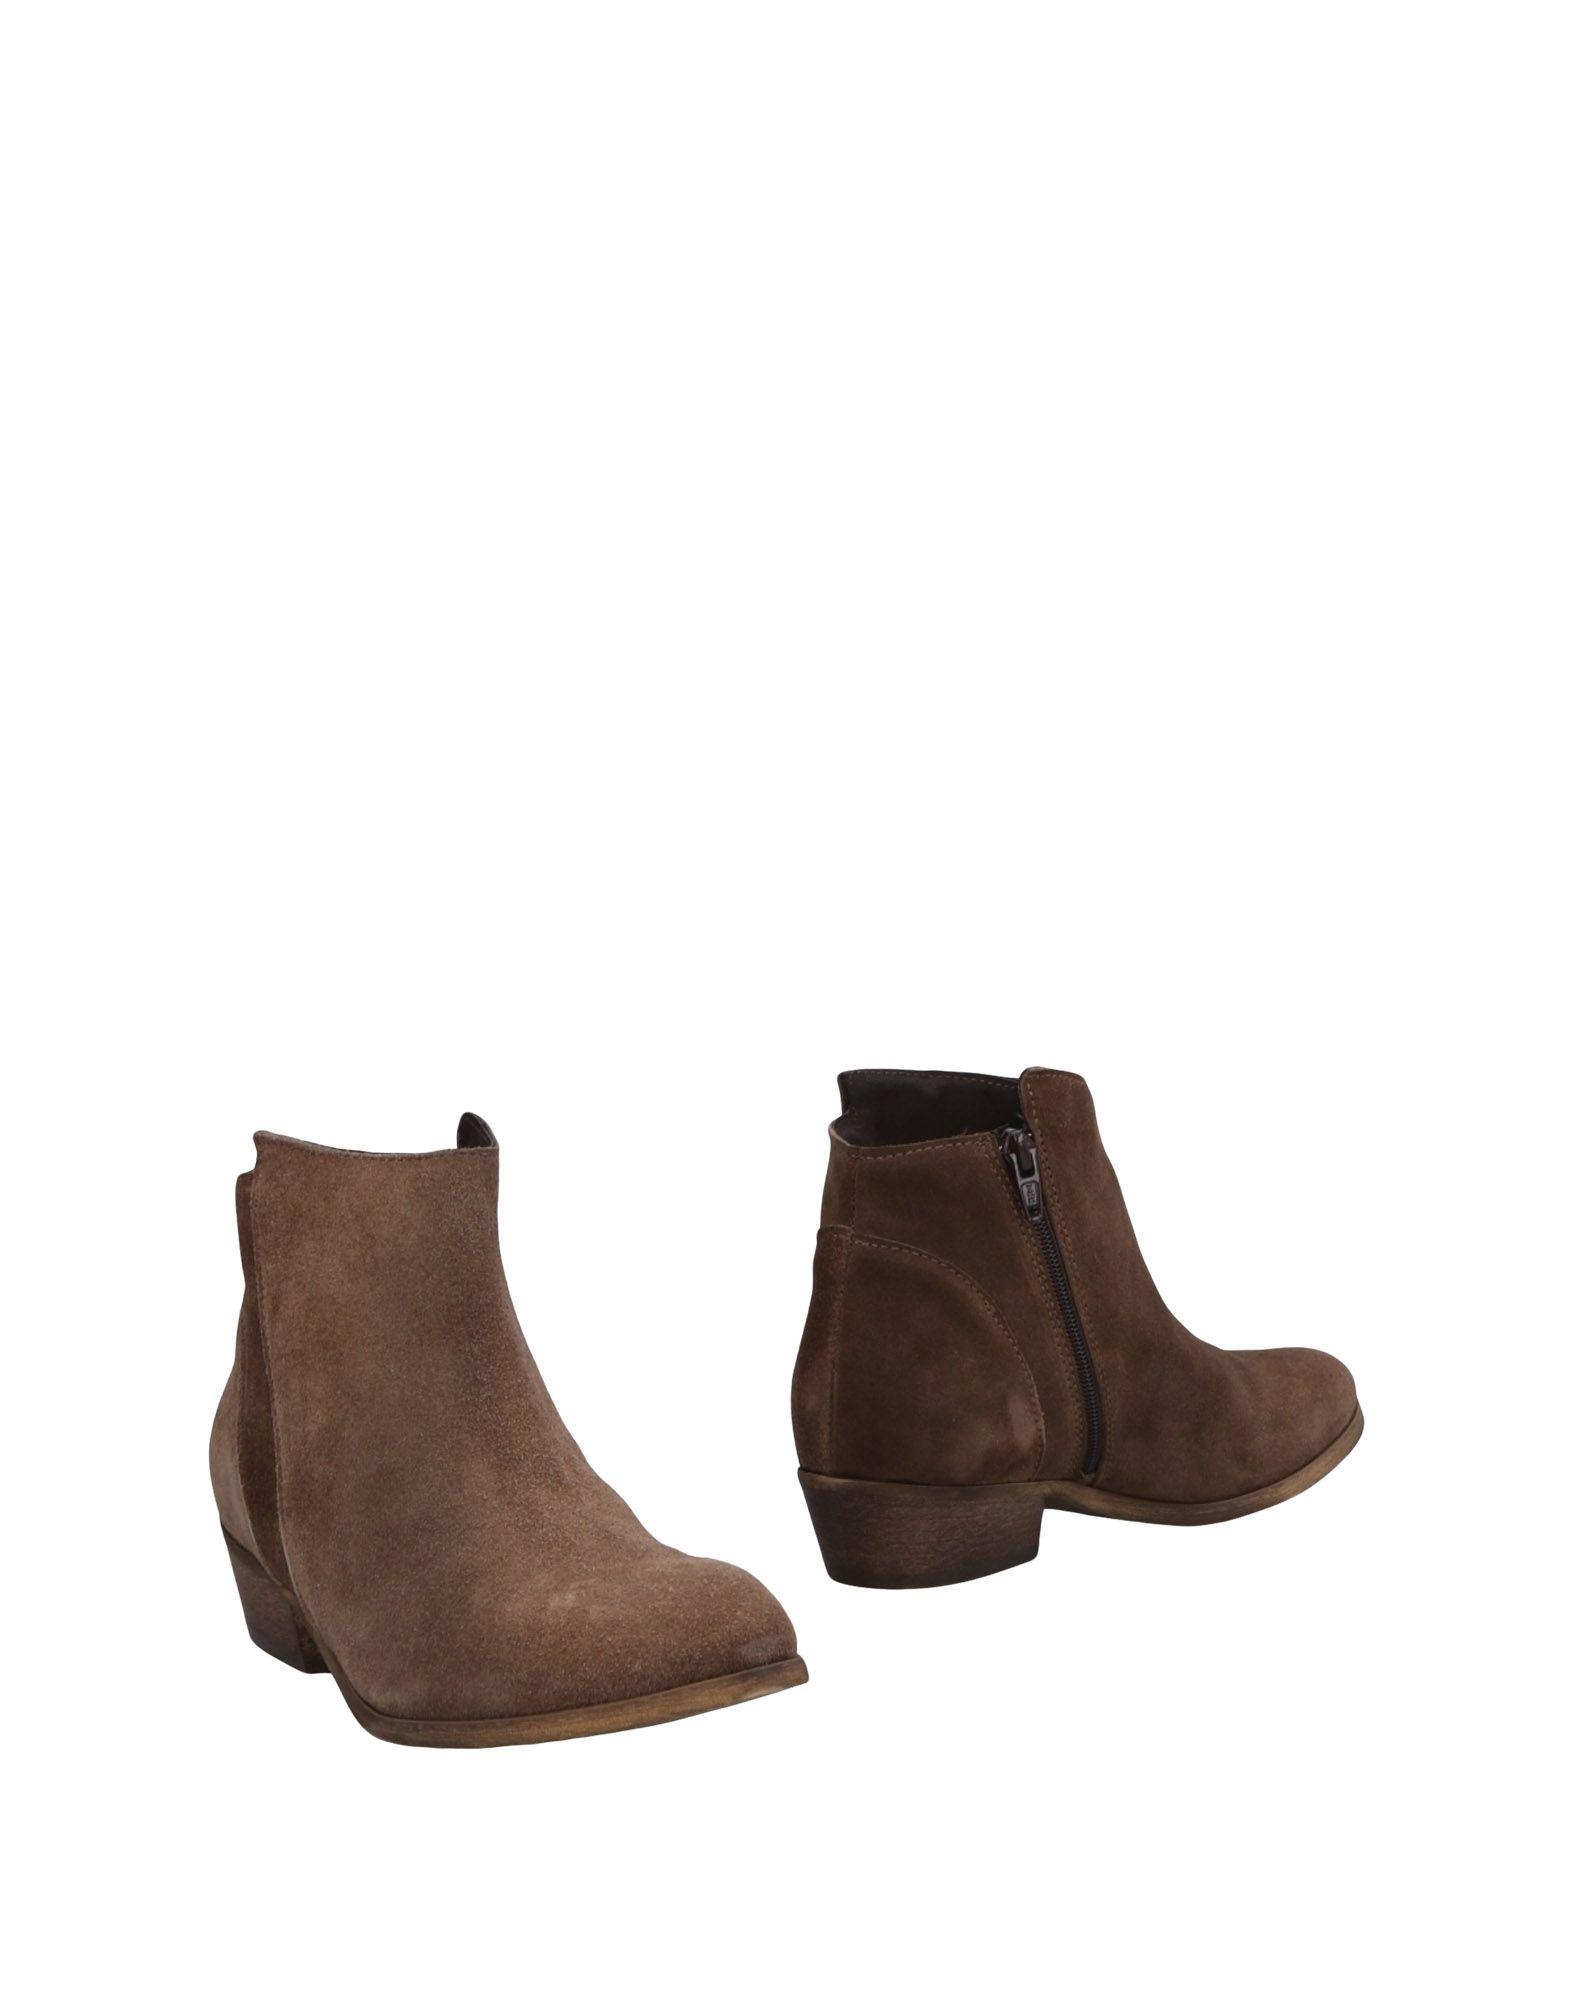 Unlace Gute Stiefelette Damen  11481573CQ Gute Unlace Qualität beliebte Schuhe 24e644